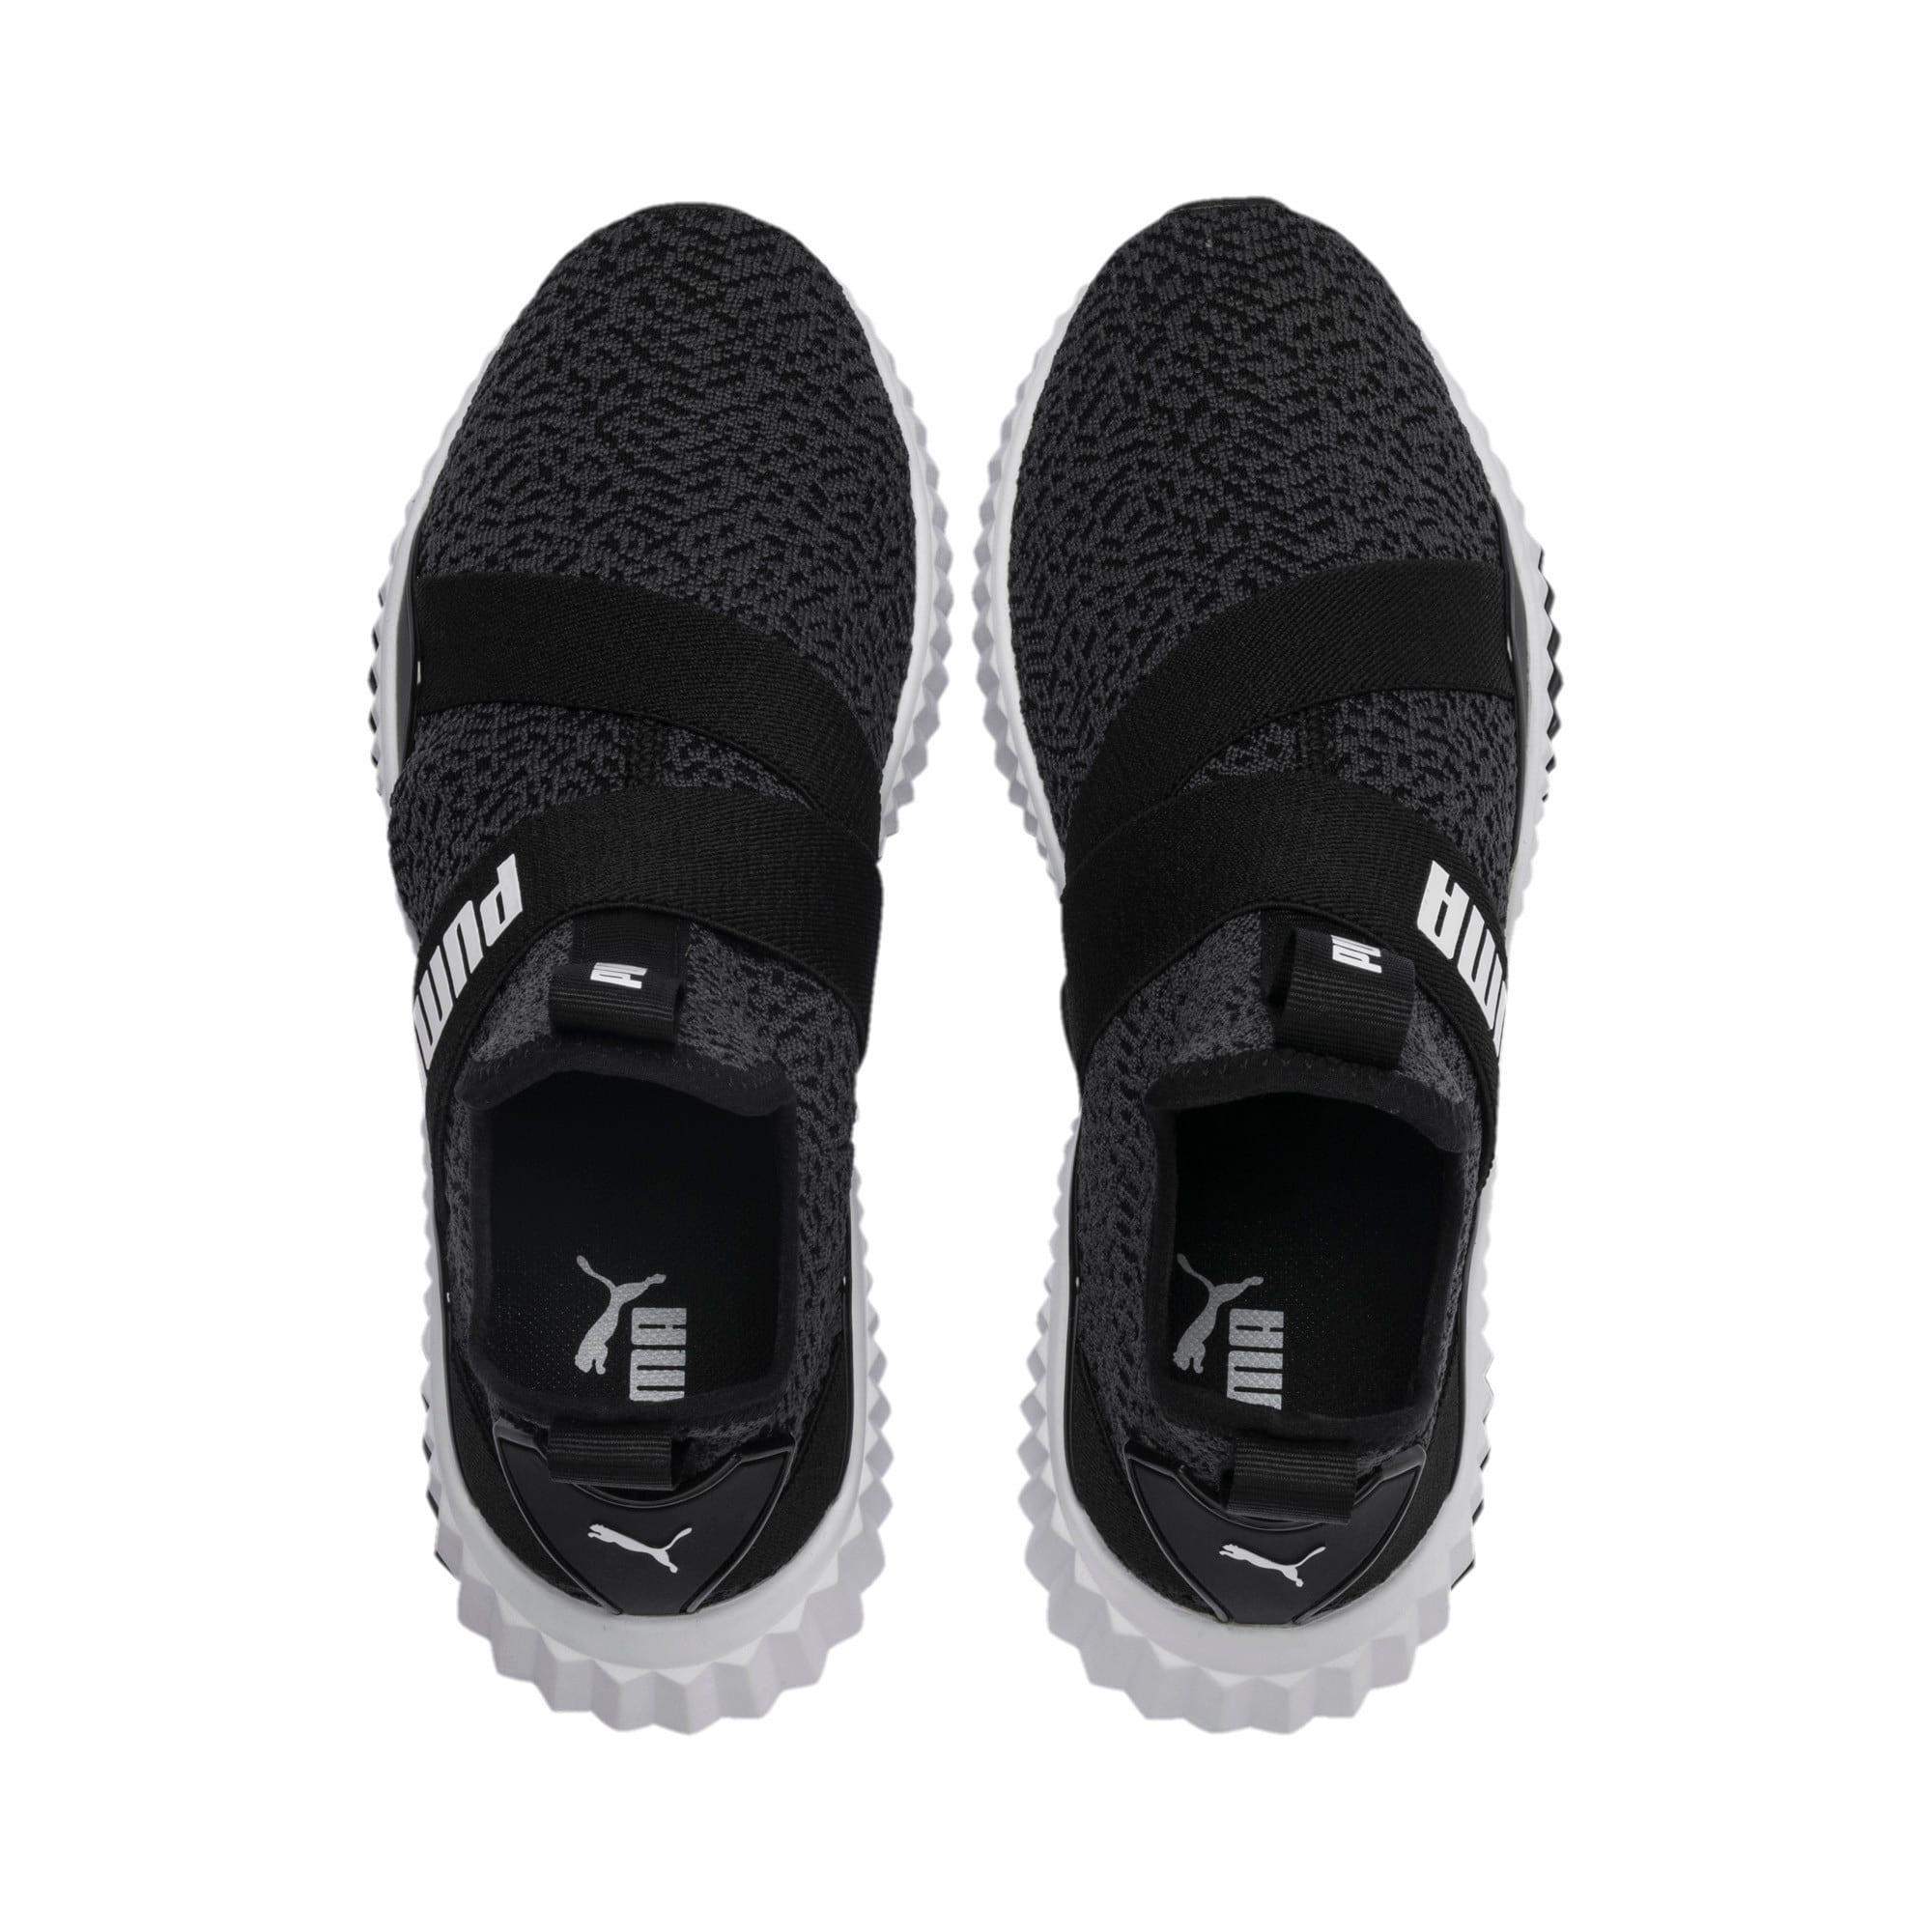 Thumbnail 5 of Defy Mid Animal Women's Training Shoes, Puma Black-Puma White, medium-IND